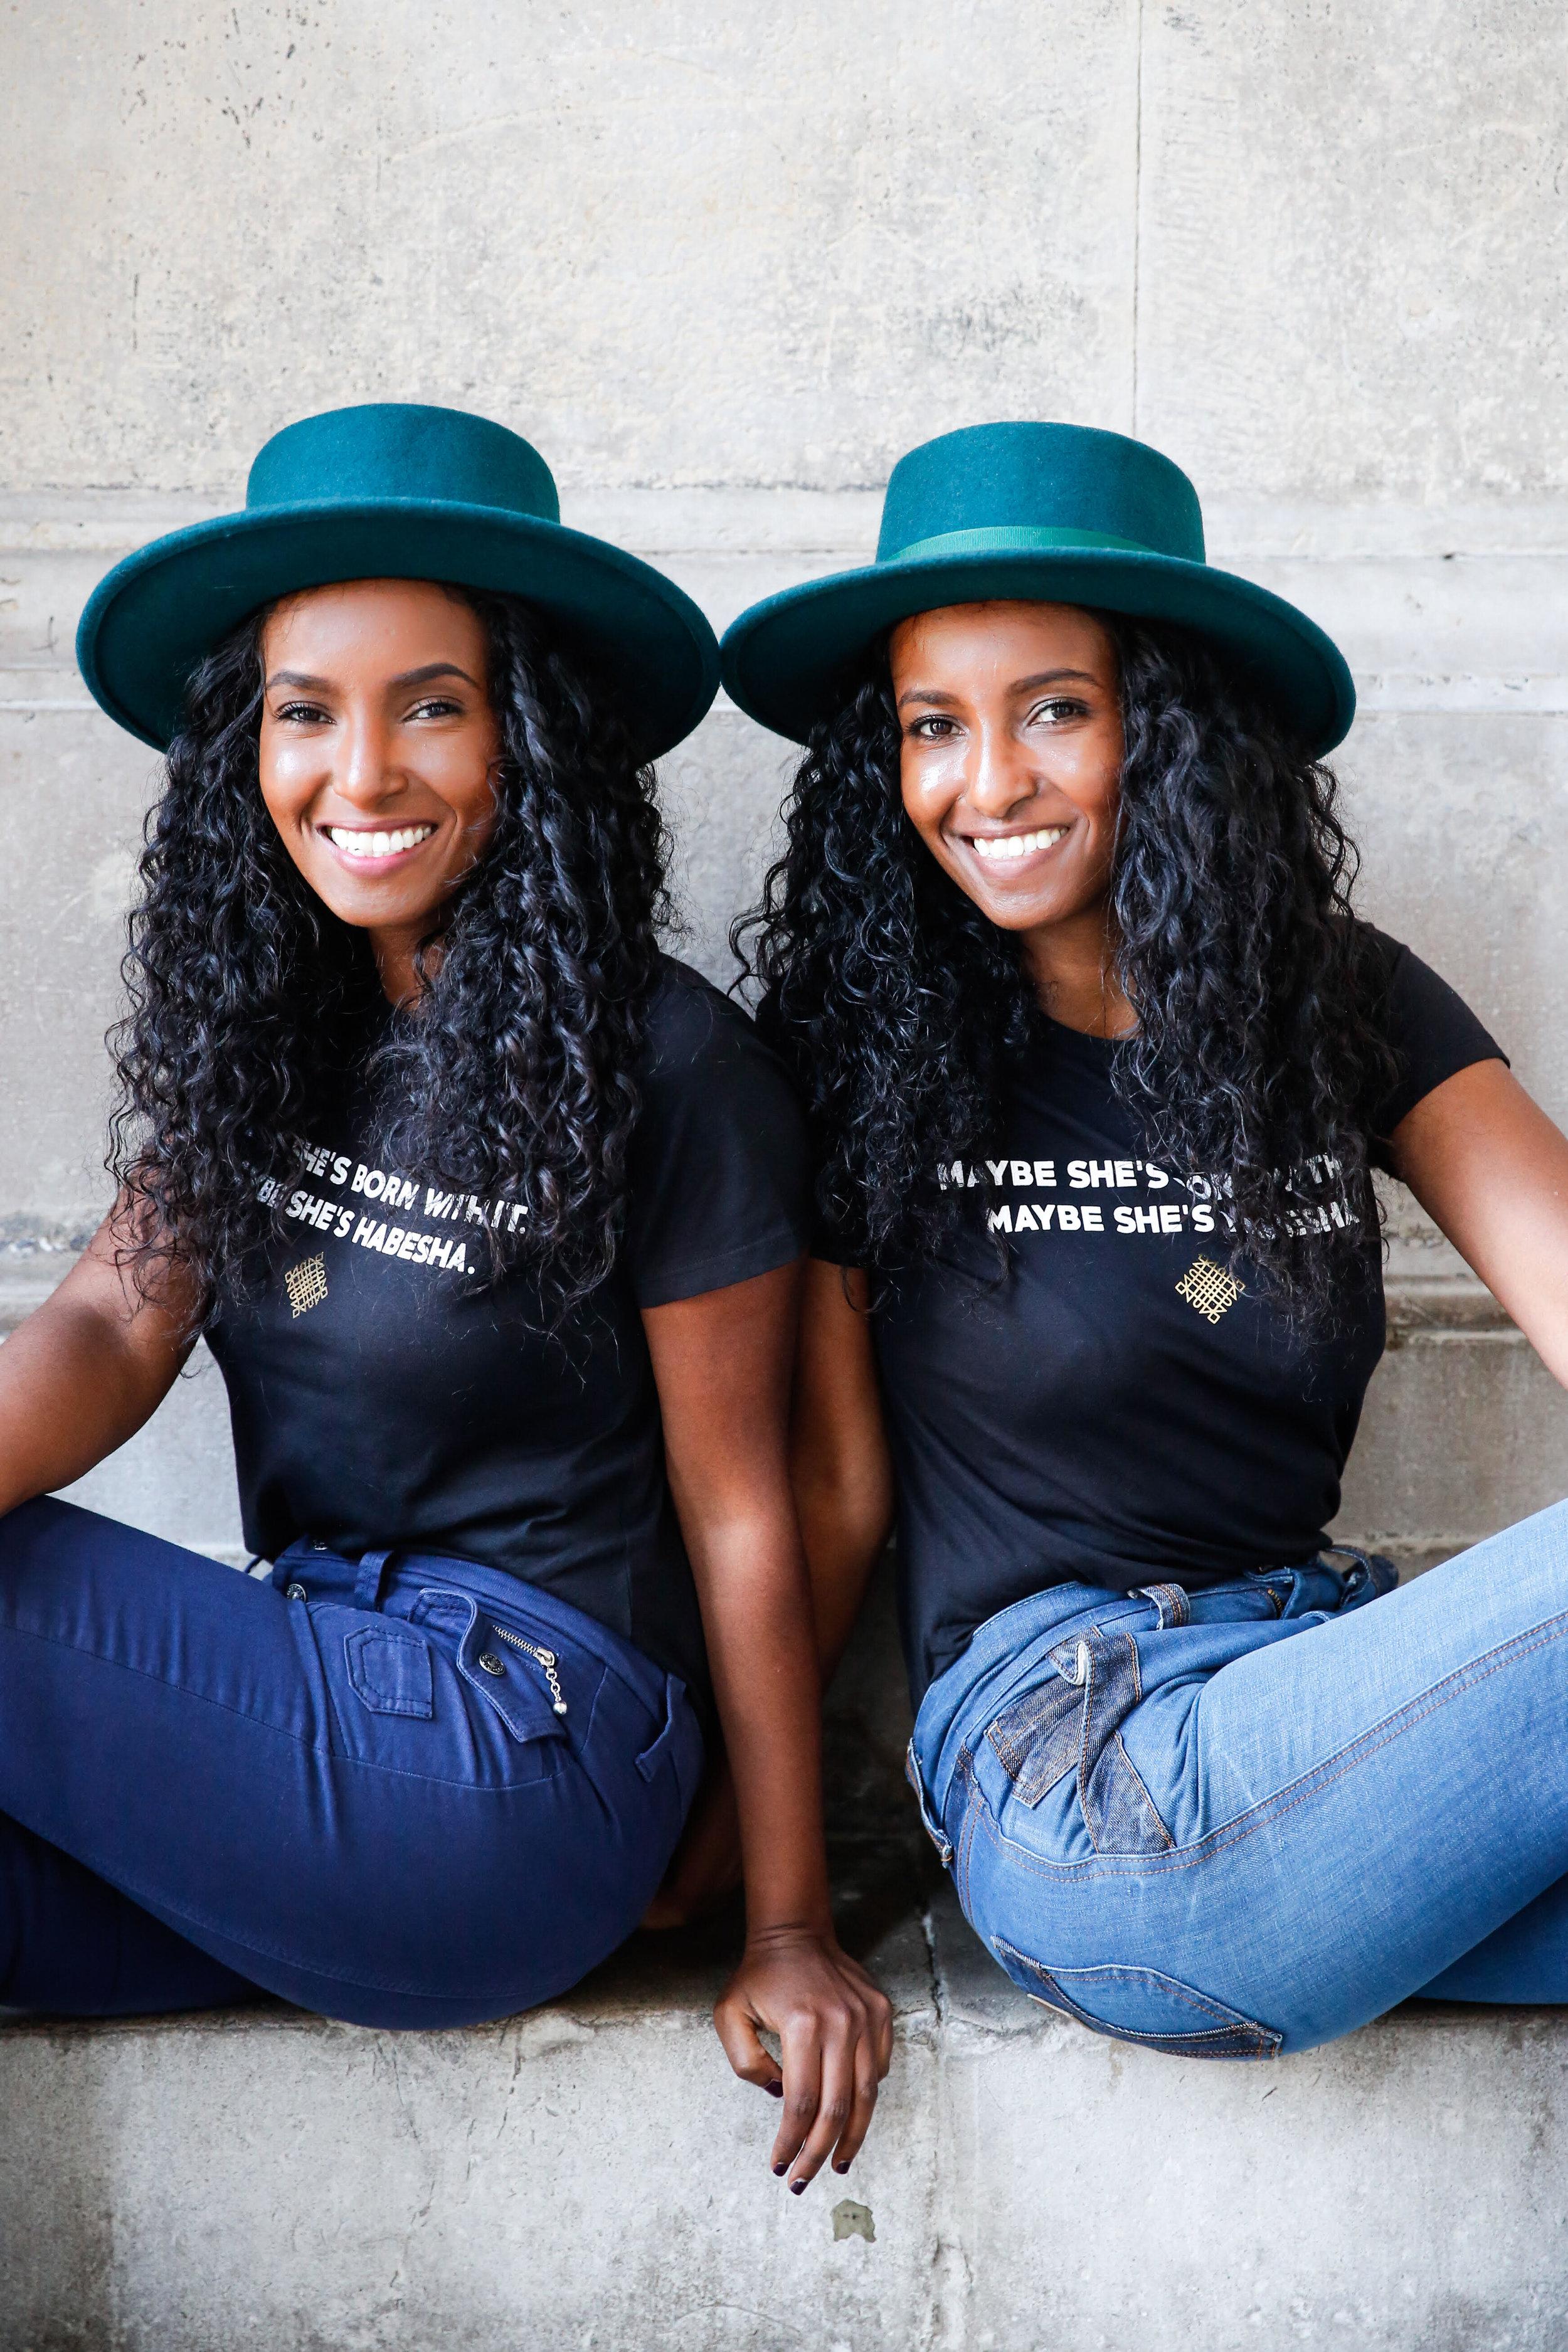 Hermon and Heroda Berhane 100-women-1.jpg